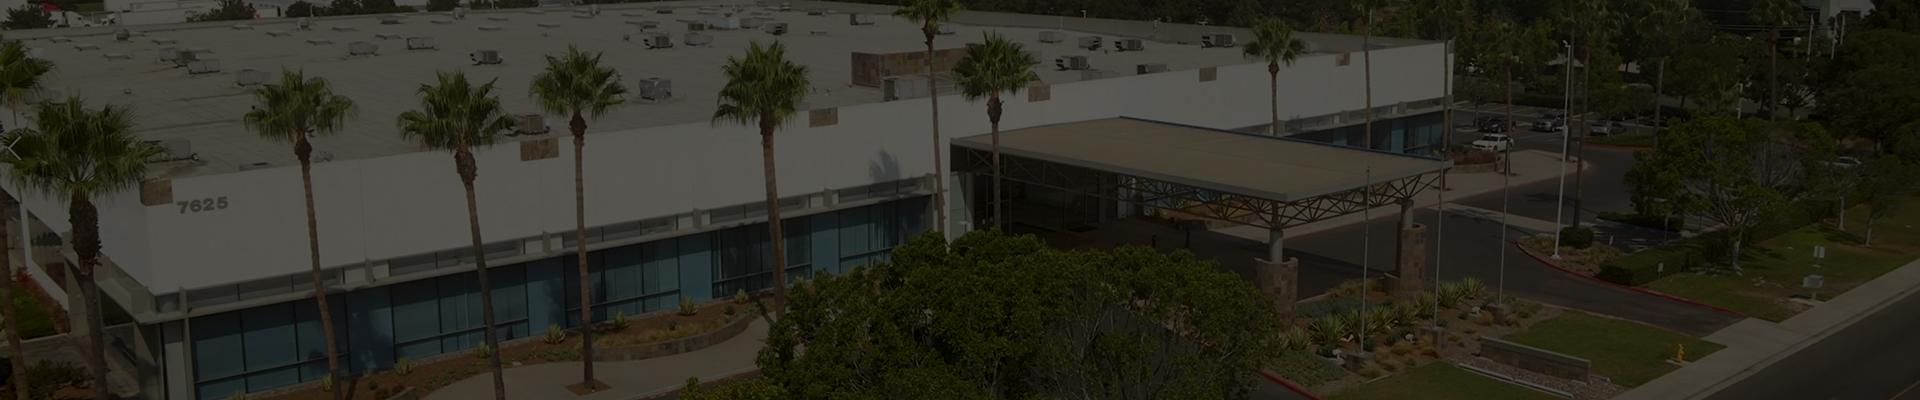 San Diego, California Composites Manufacturing Facility